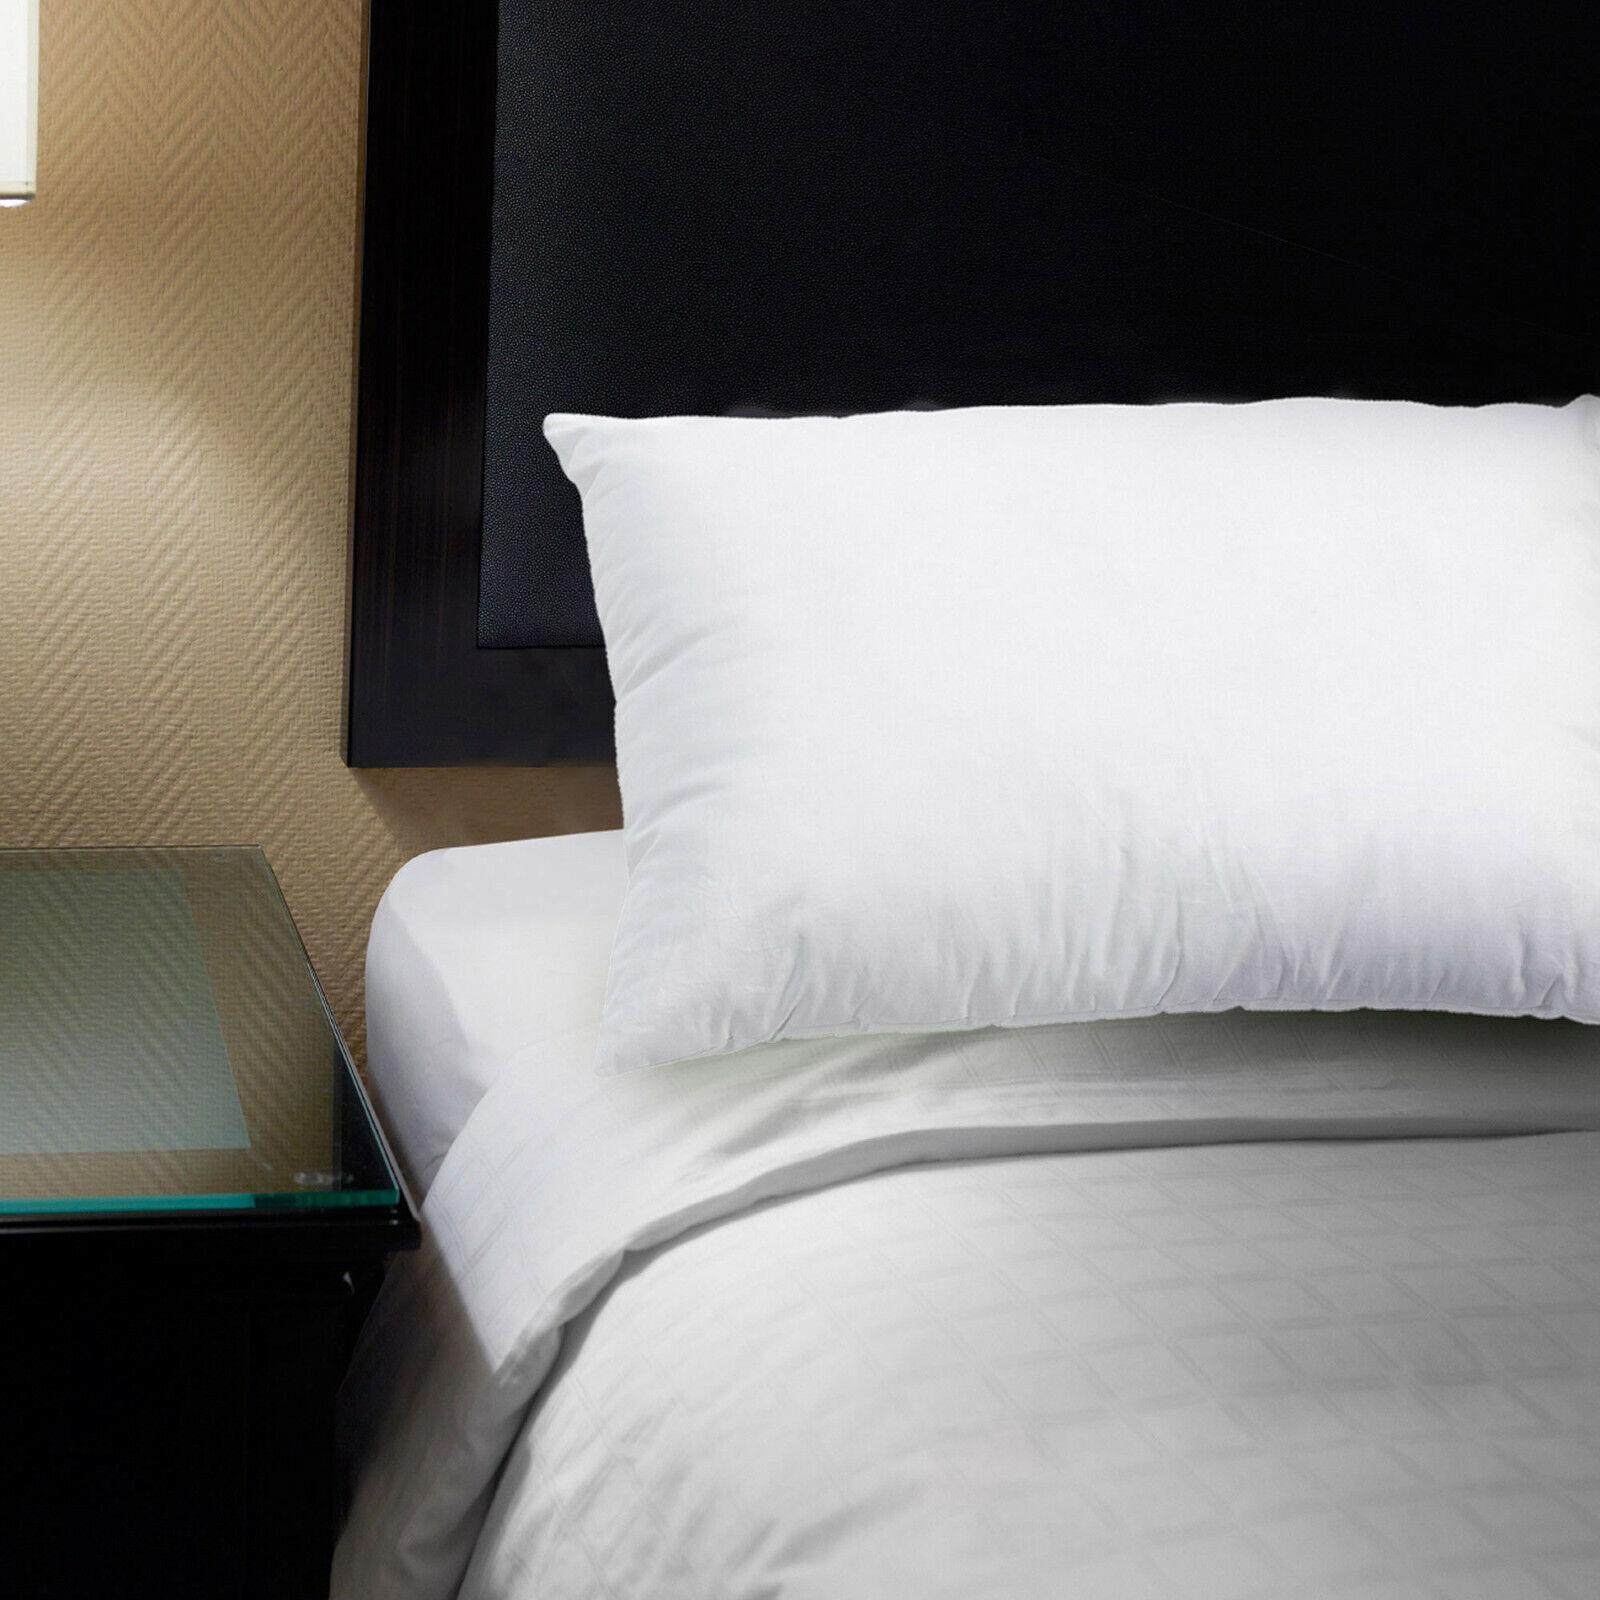 20 x 36 size down alternative bed